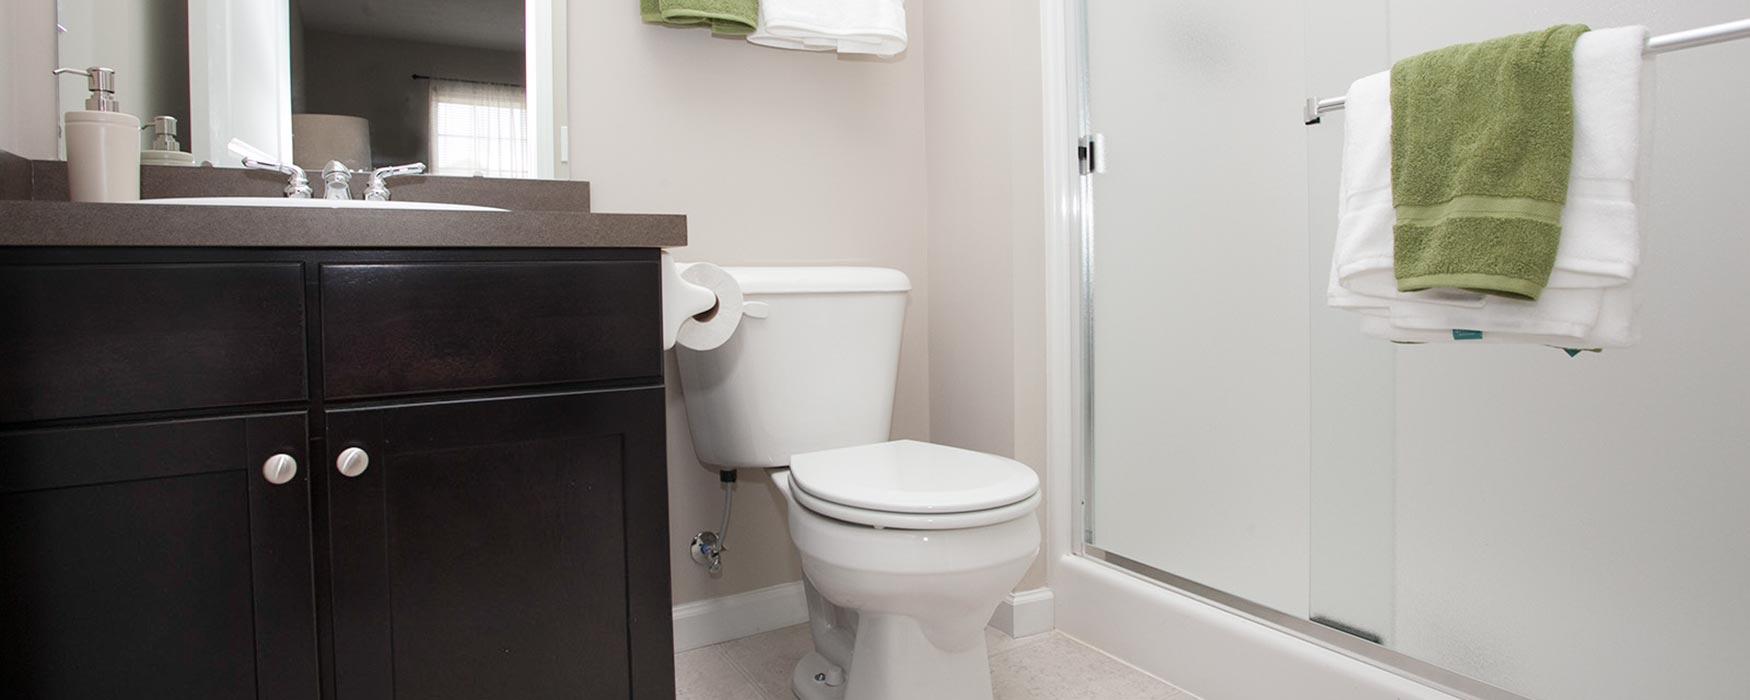 LC Paddock | Bentley Town Bathroom